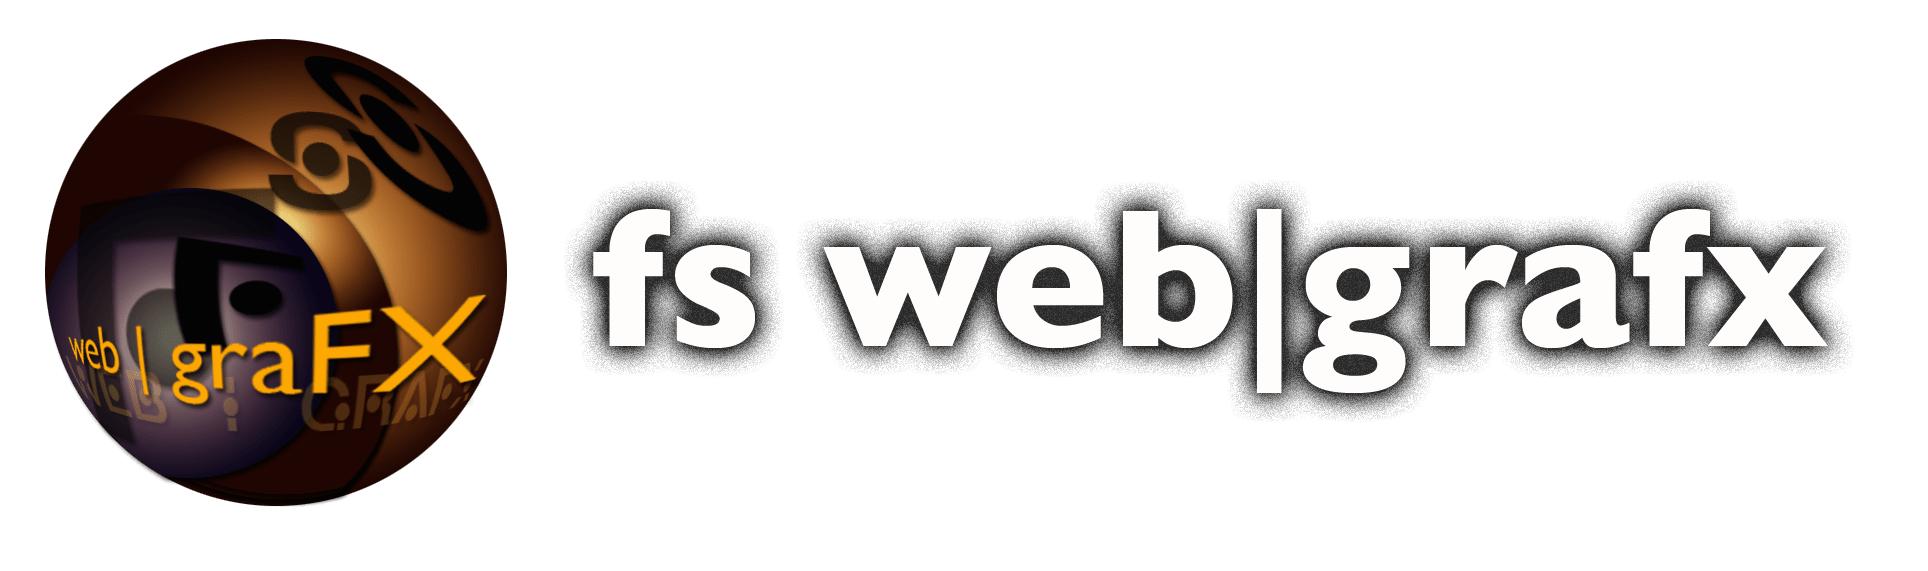 fs web graFX